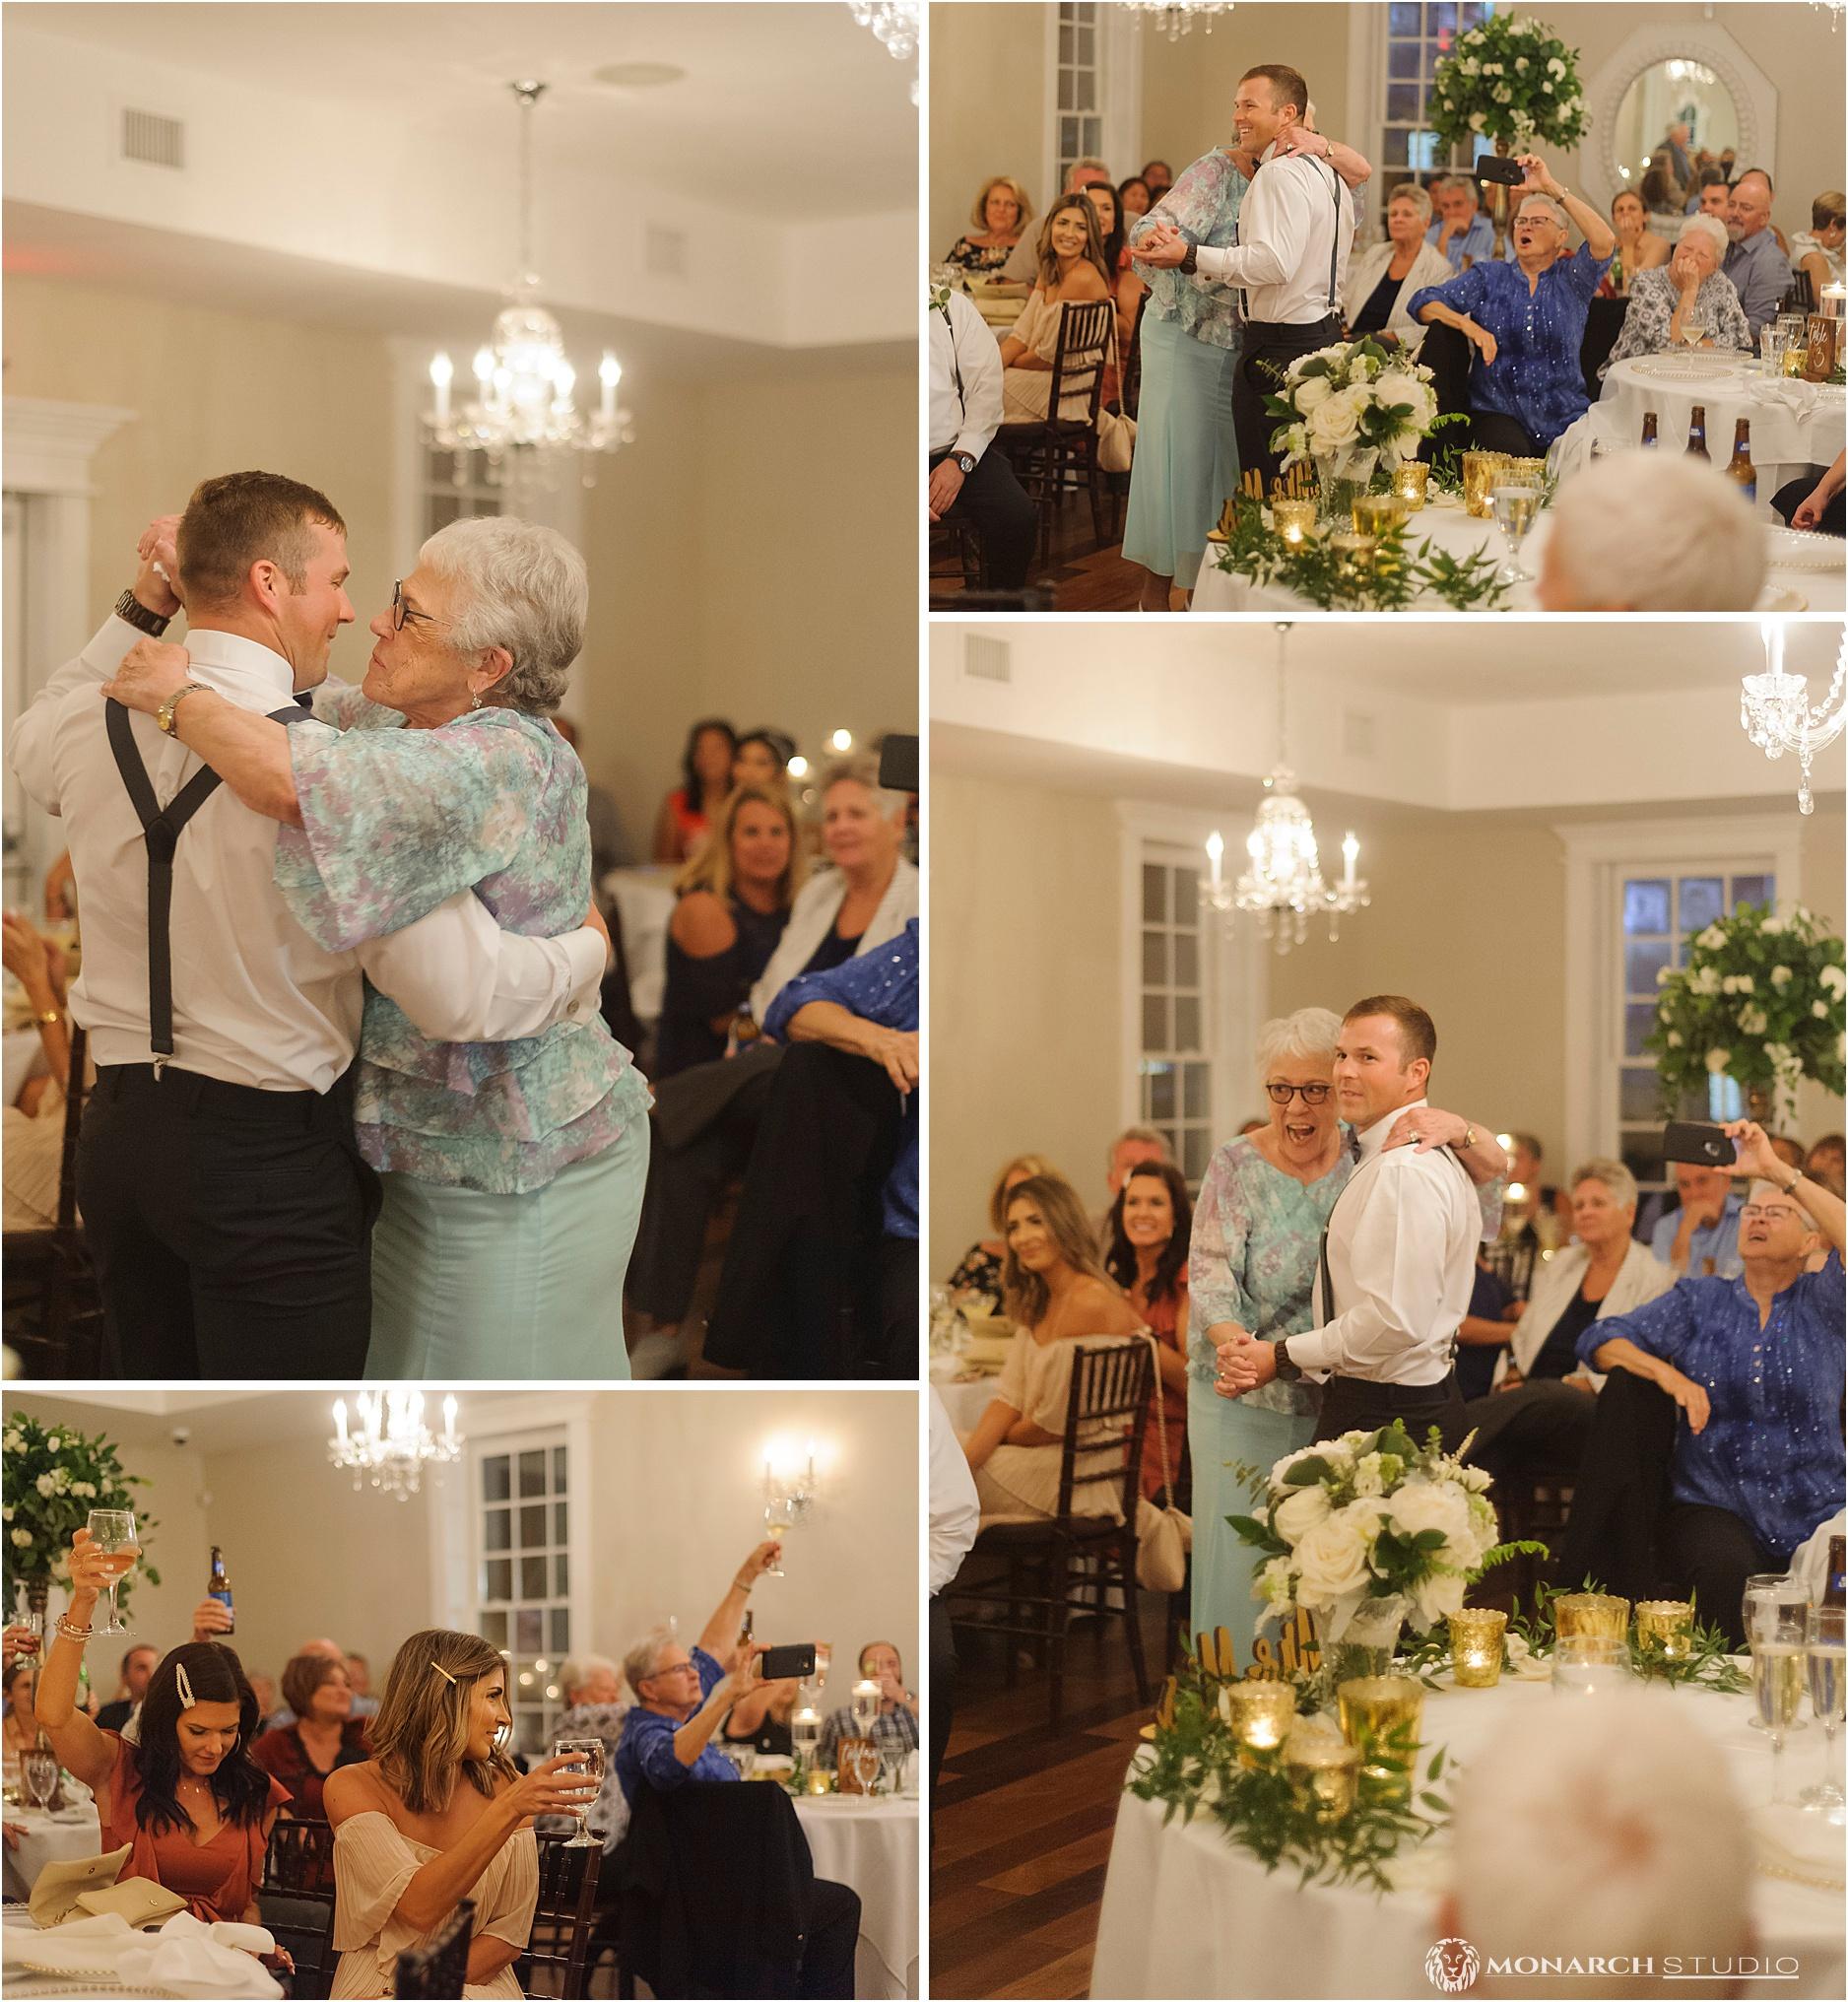 099-whiteroom-wedding-photographer-2019-05-22_0081.jpg